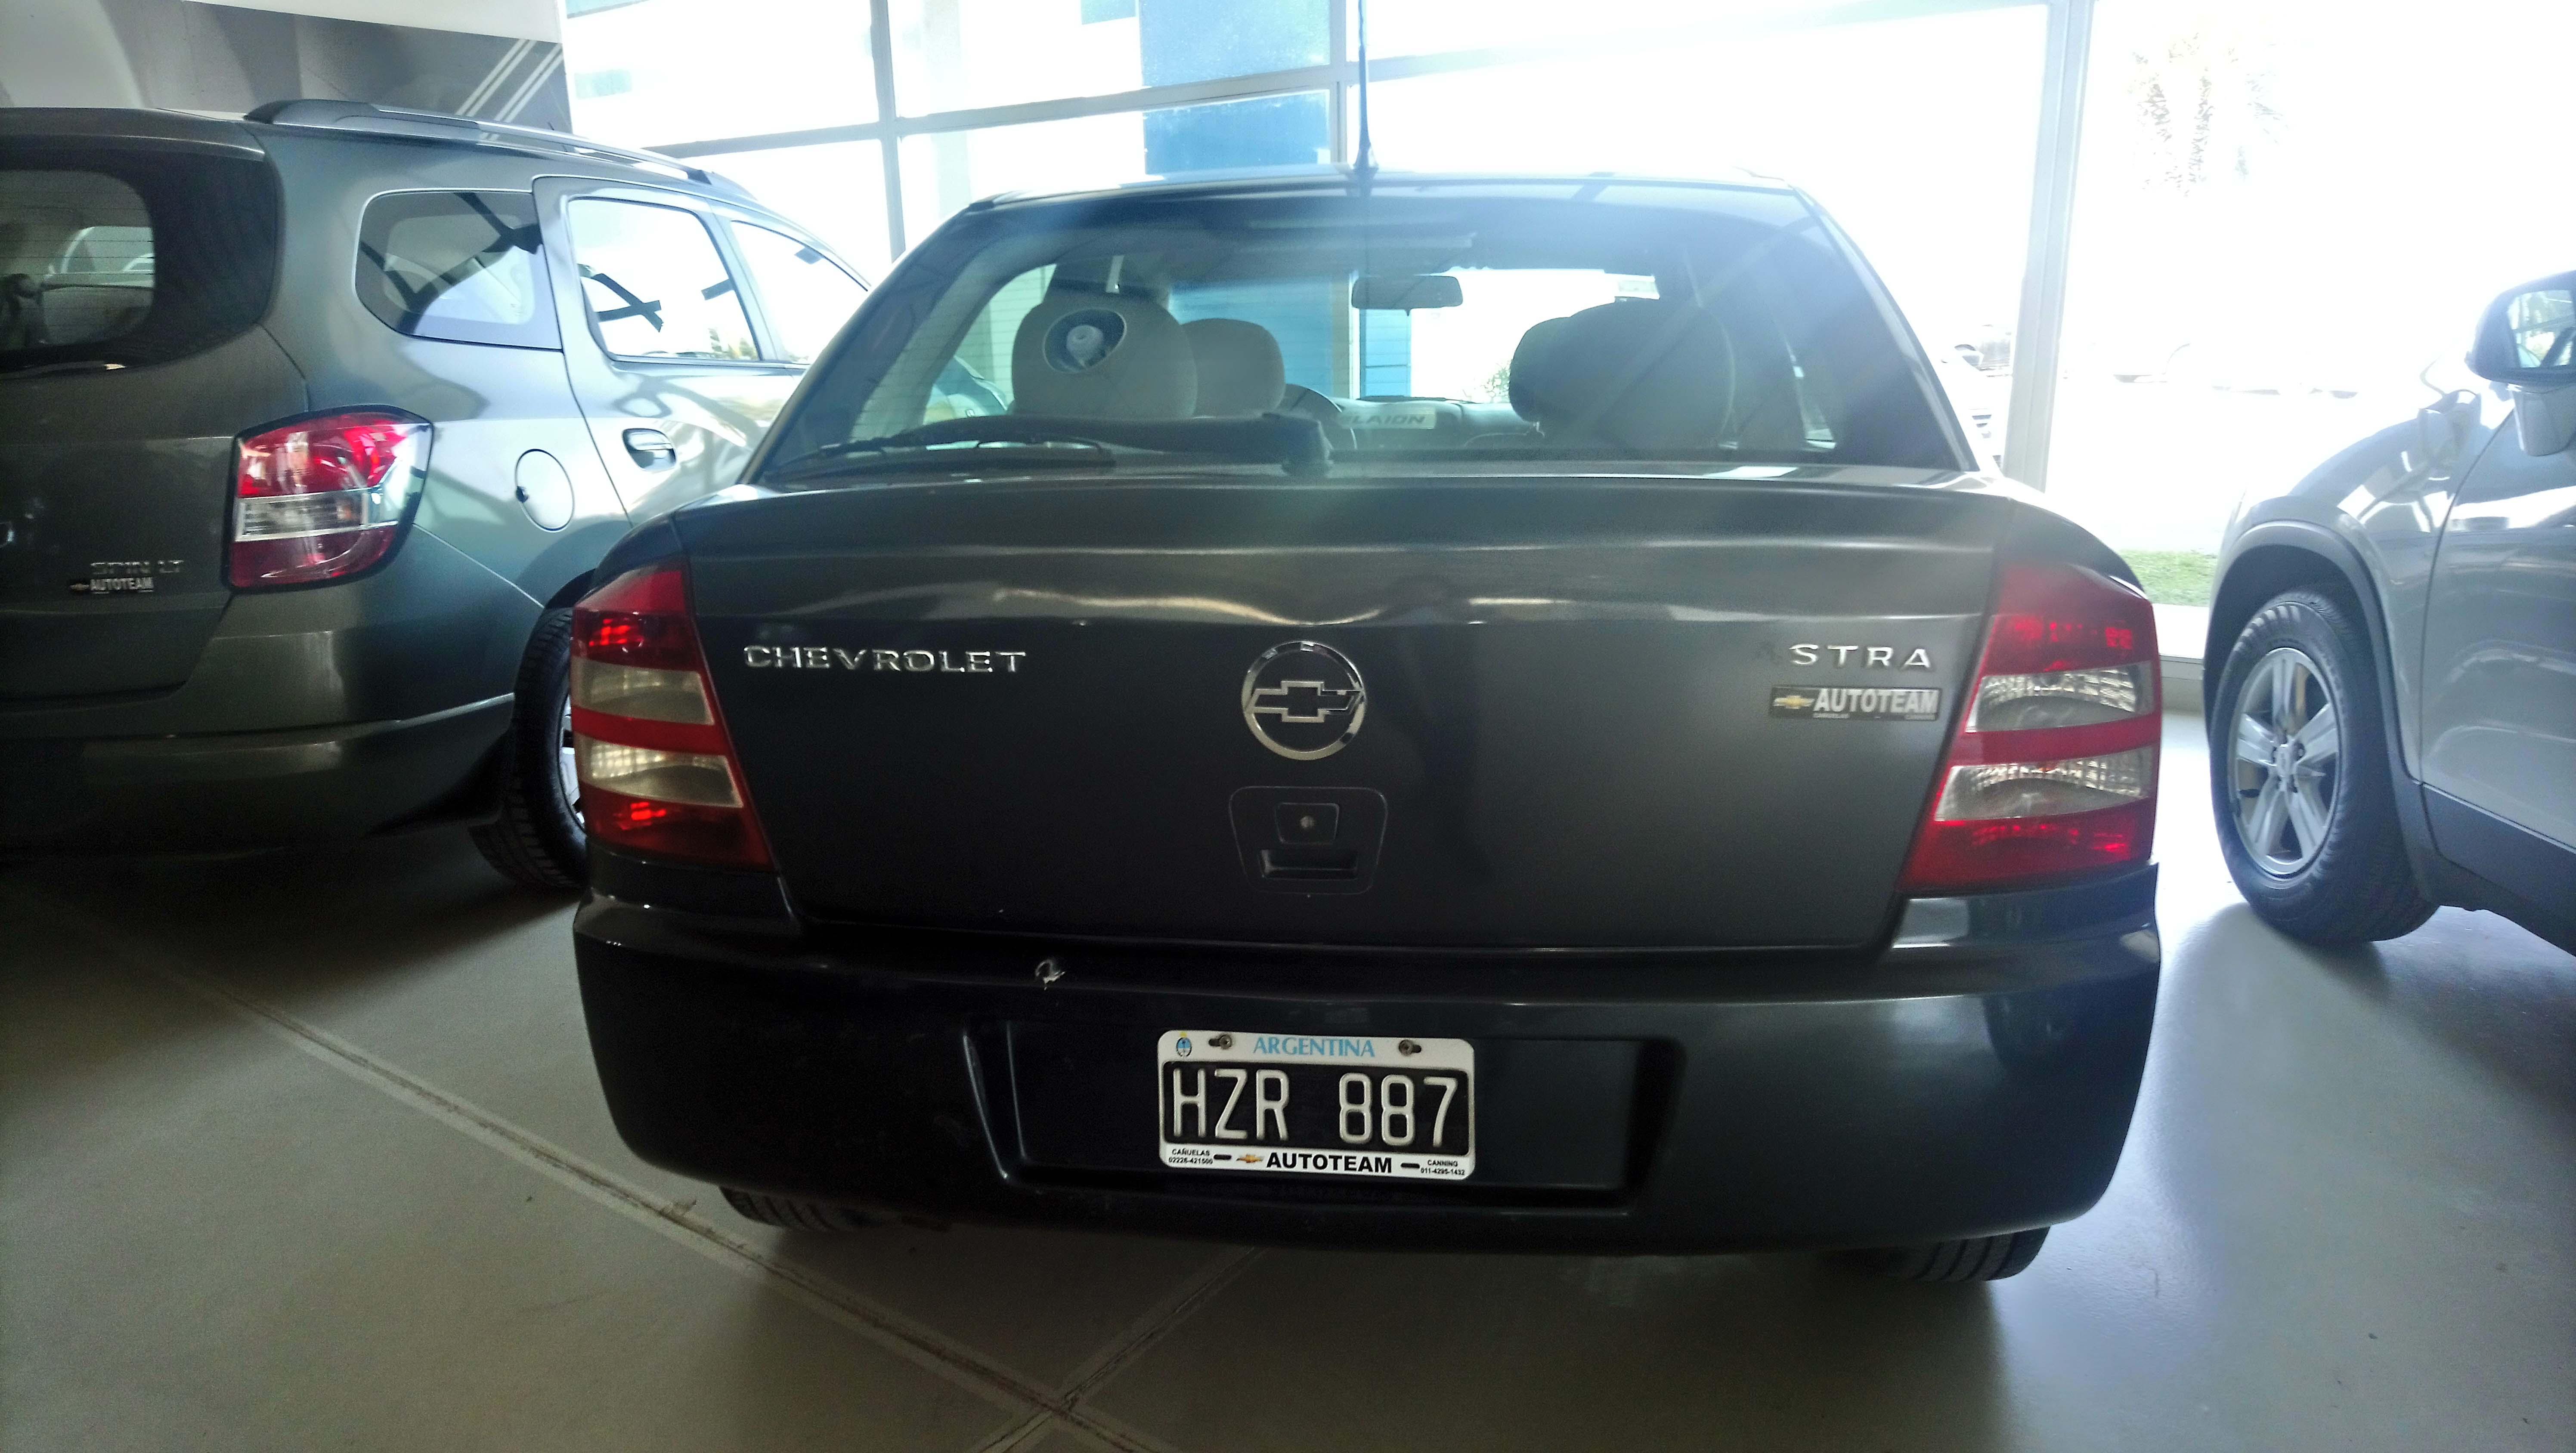 2009 Chevrolet Astra II 5 Ptas GL 2.0L